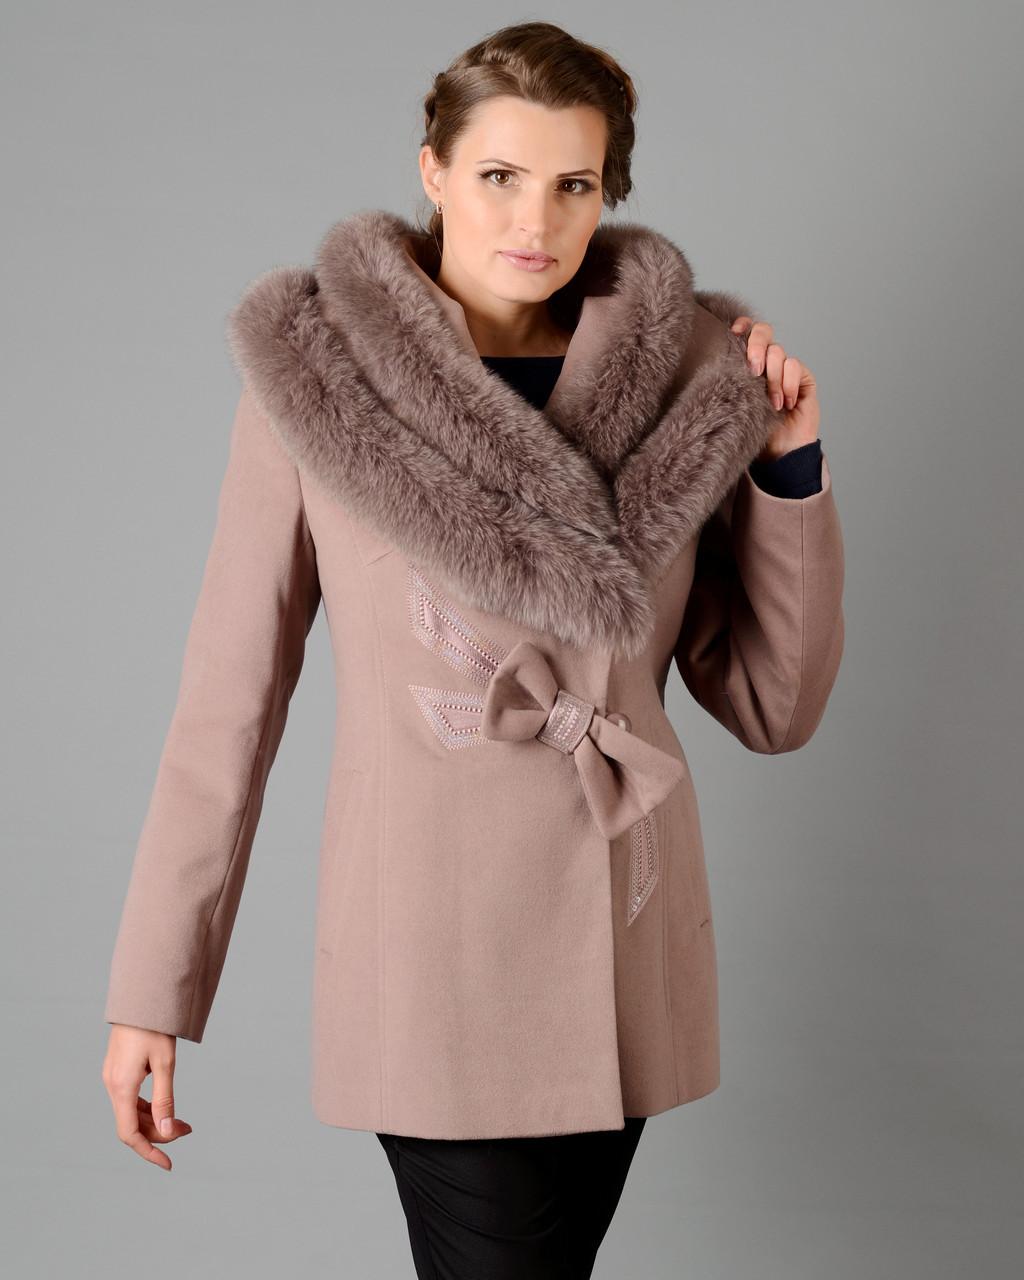 Зимнее пальто Бант